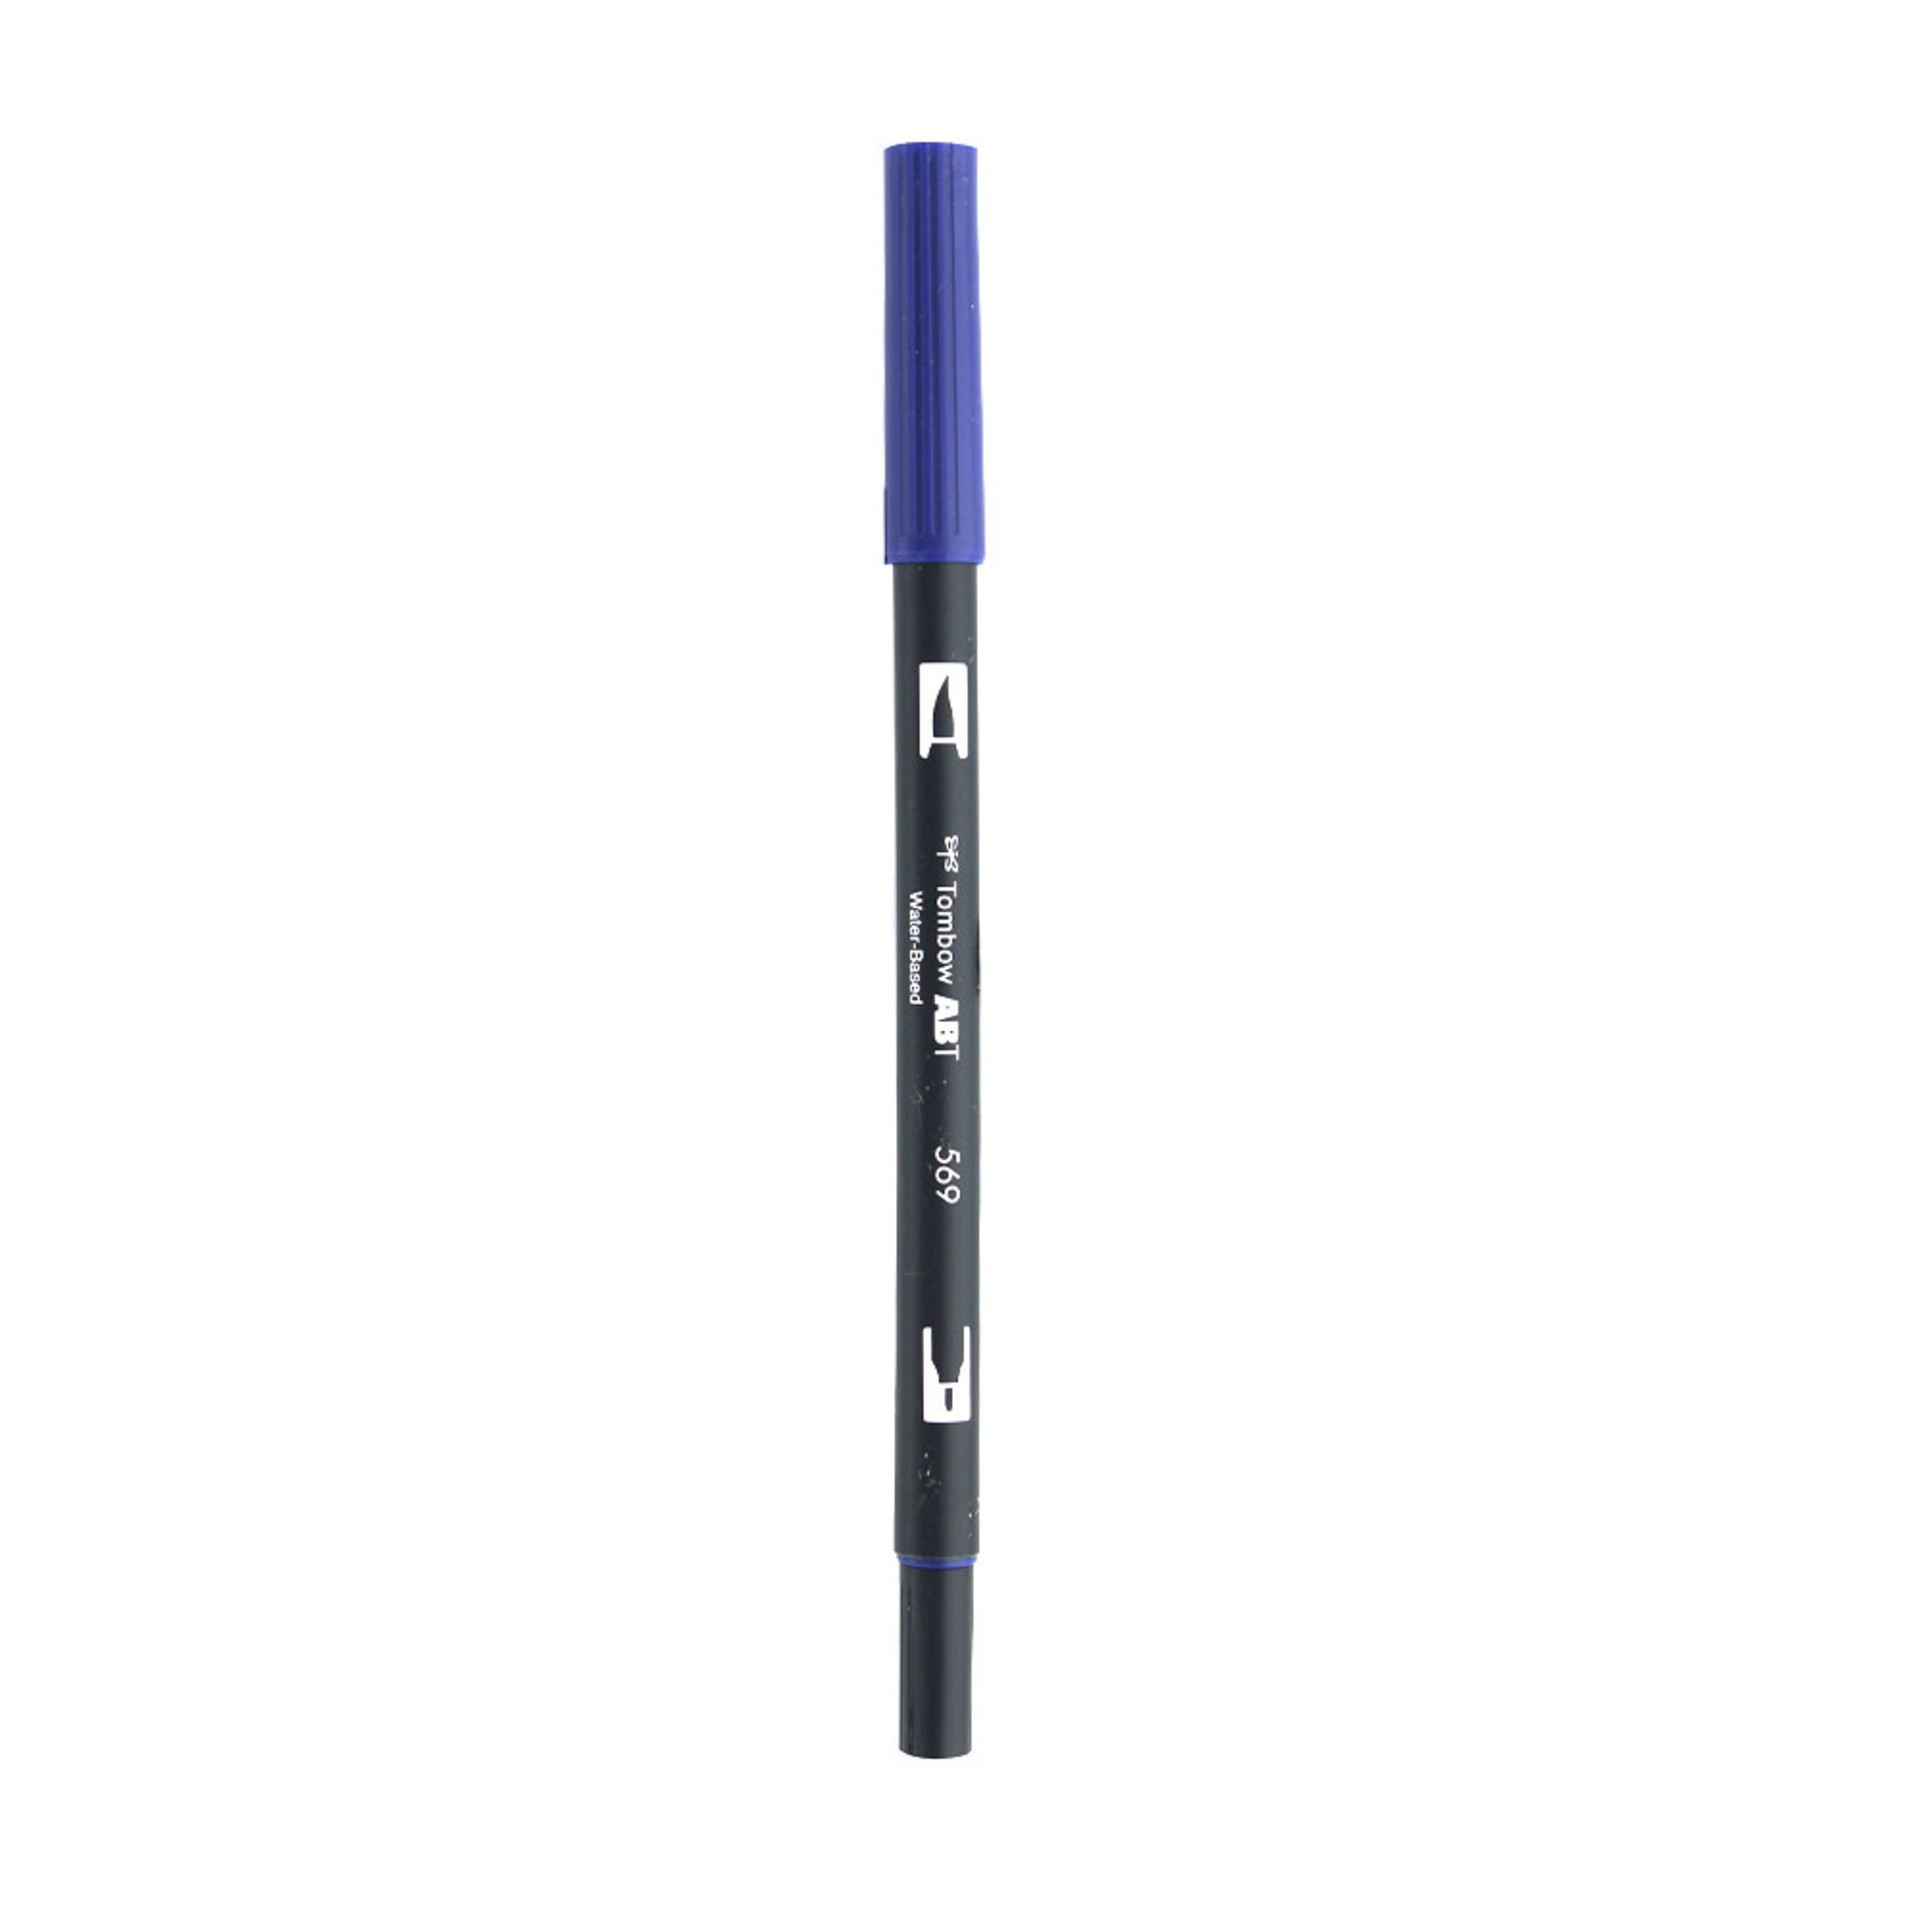 Tombow Dual-Tip Brush Marker Pen – Jet